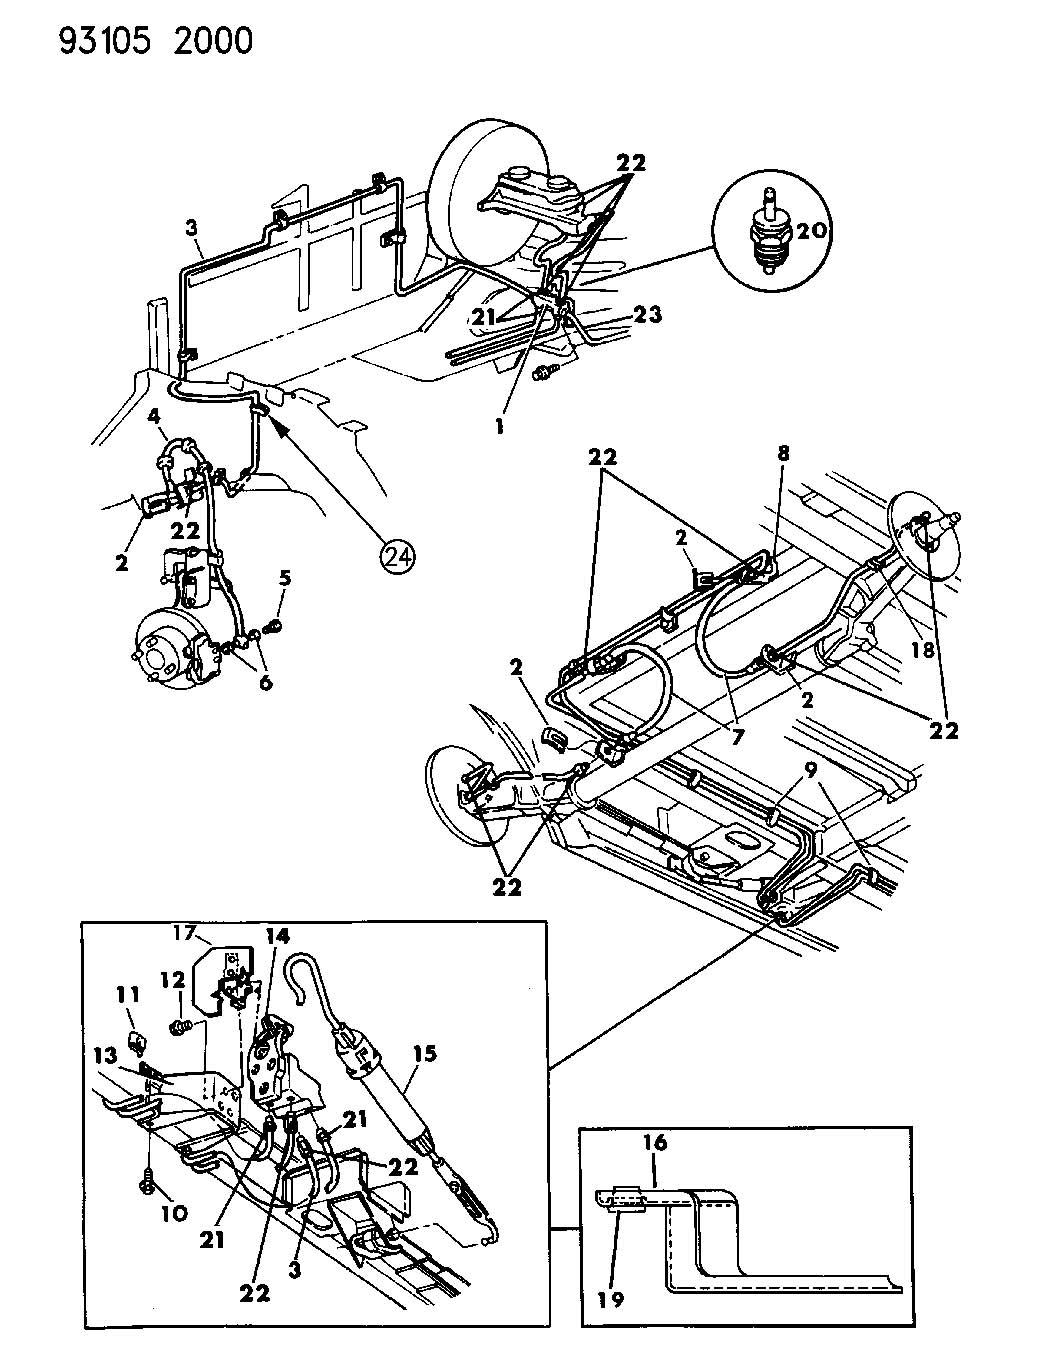 1988 Dodge Grand Caravan Valve. Height sensing brake